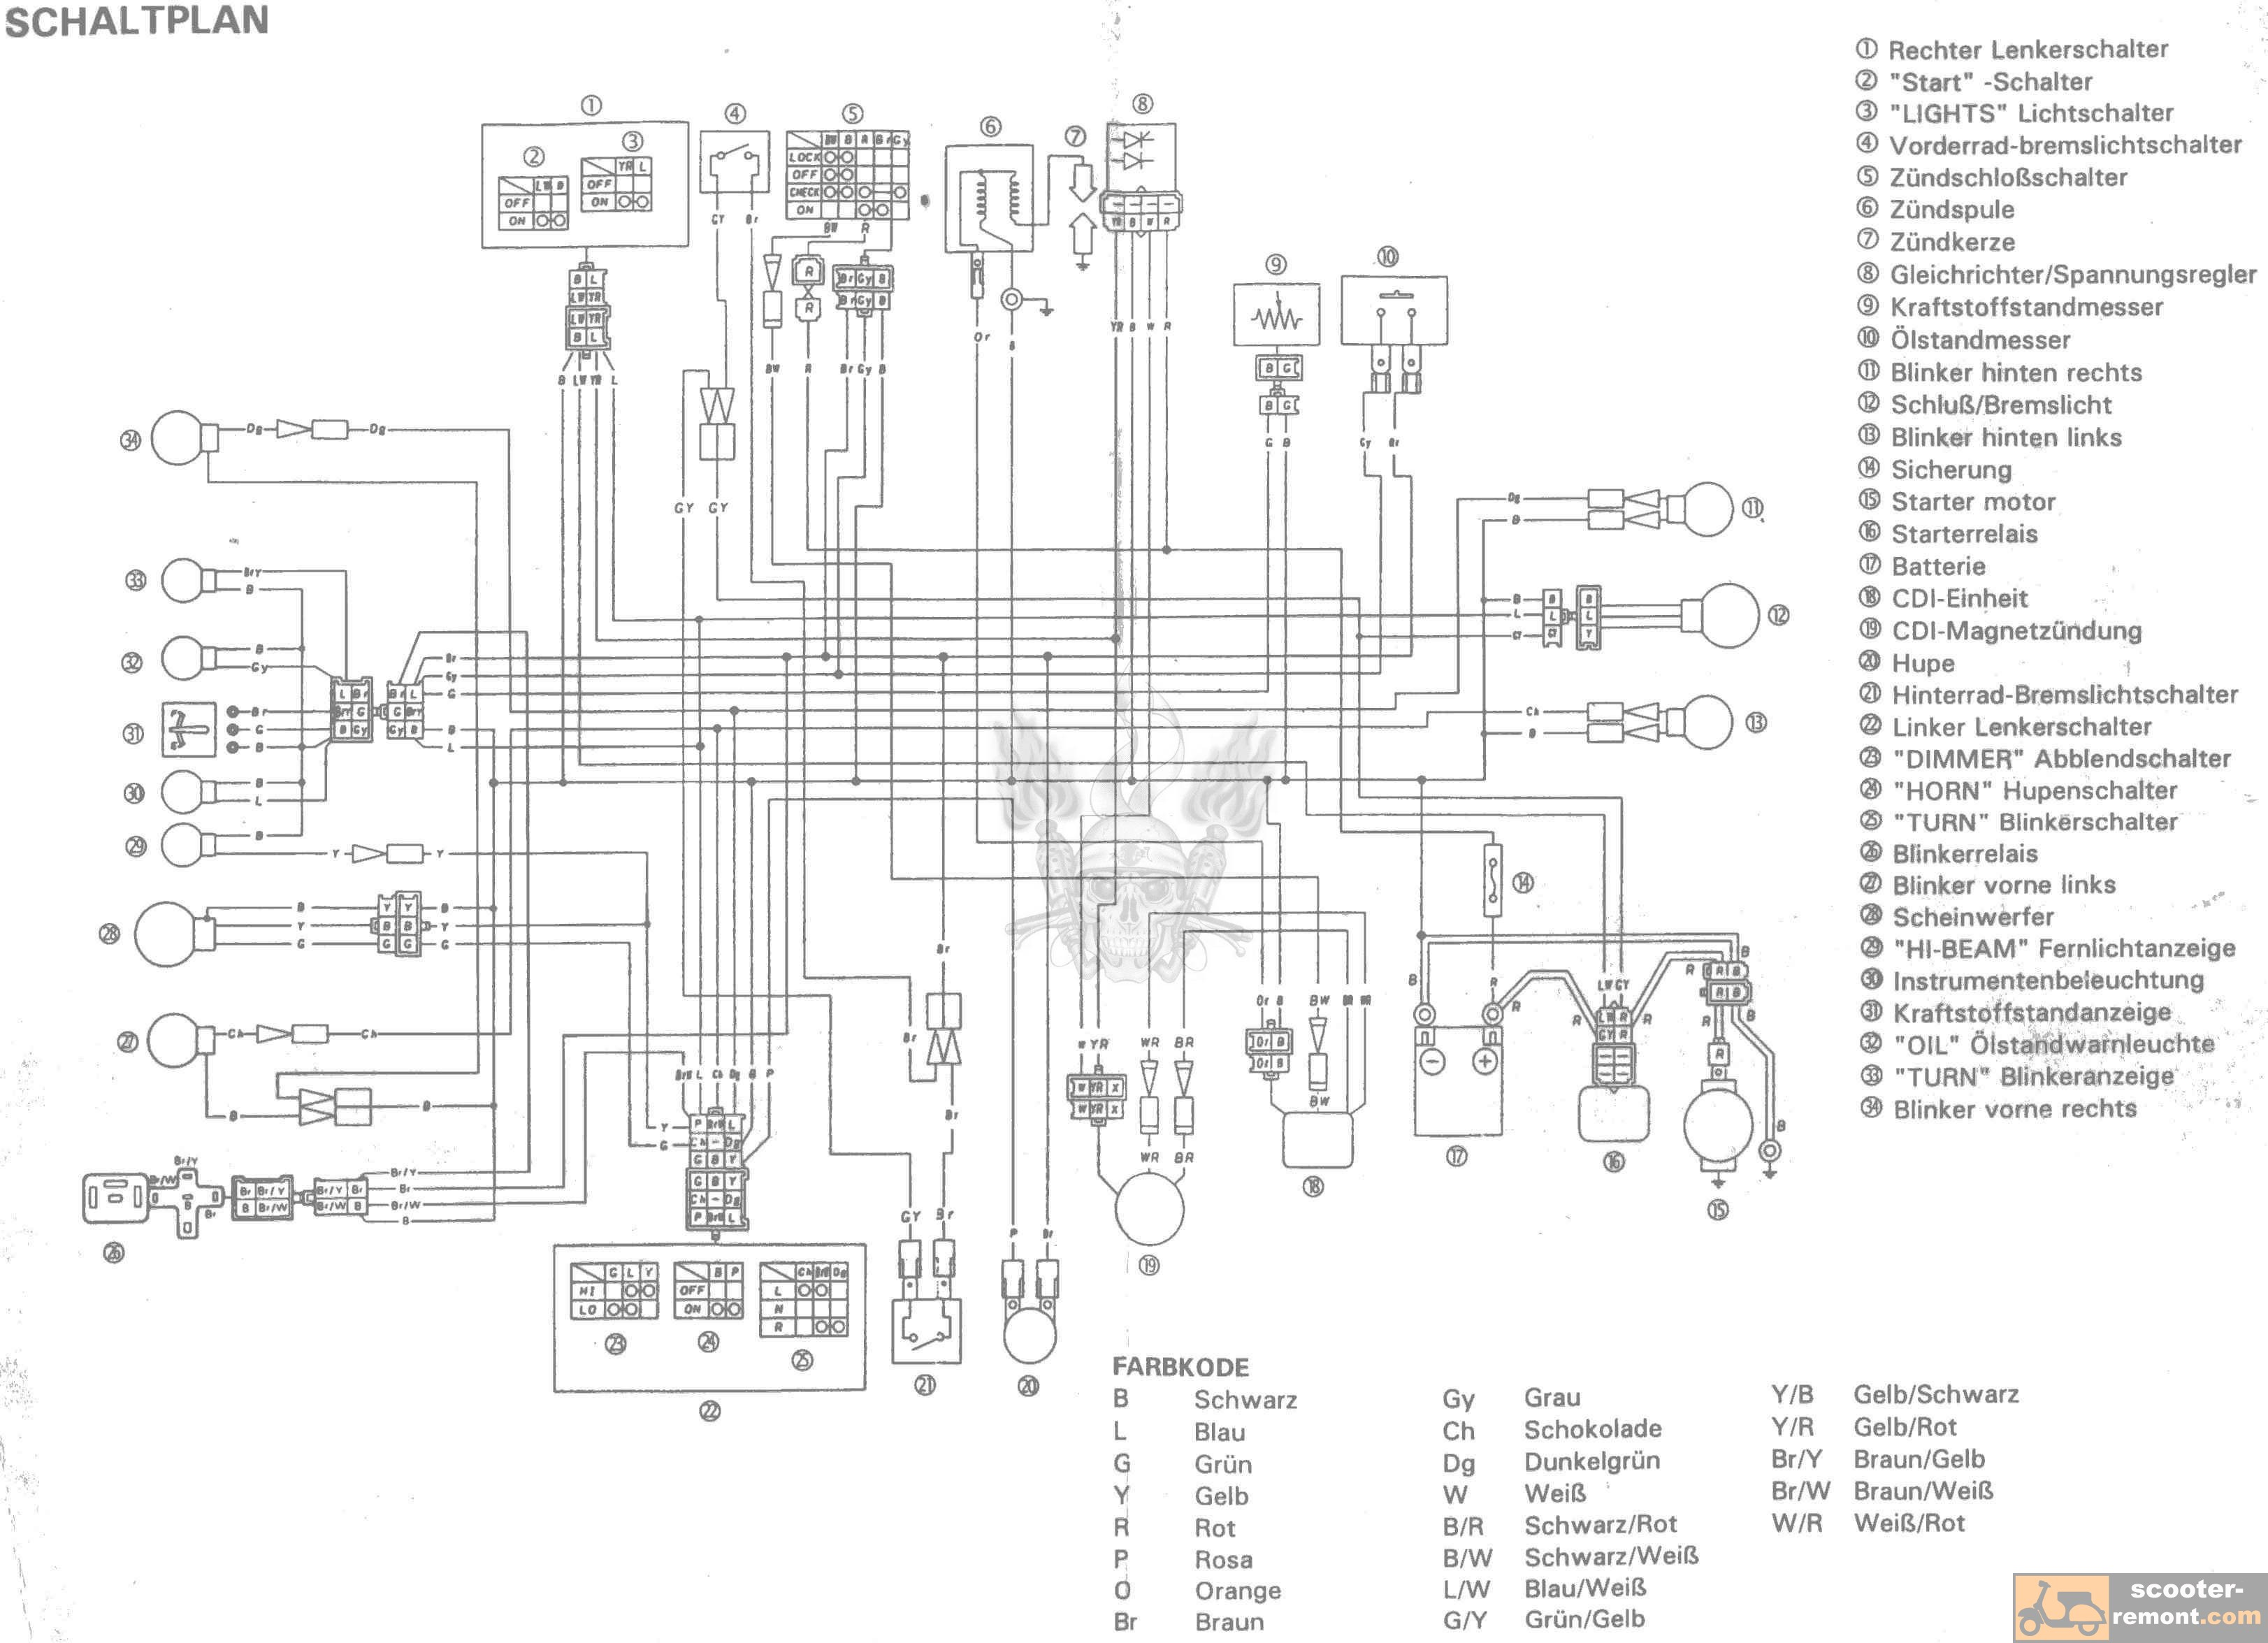 инструкция по эксплуатации хонда такт аф 16